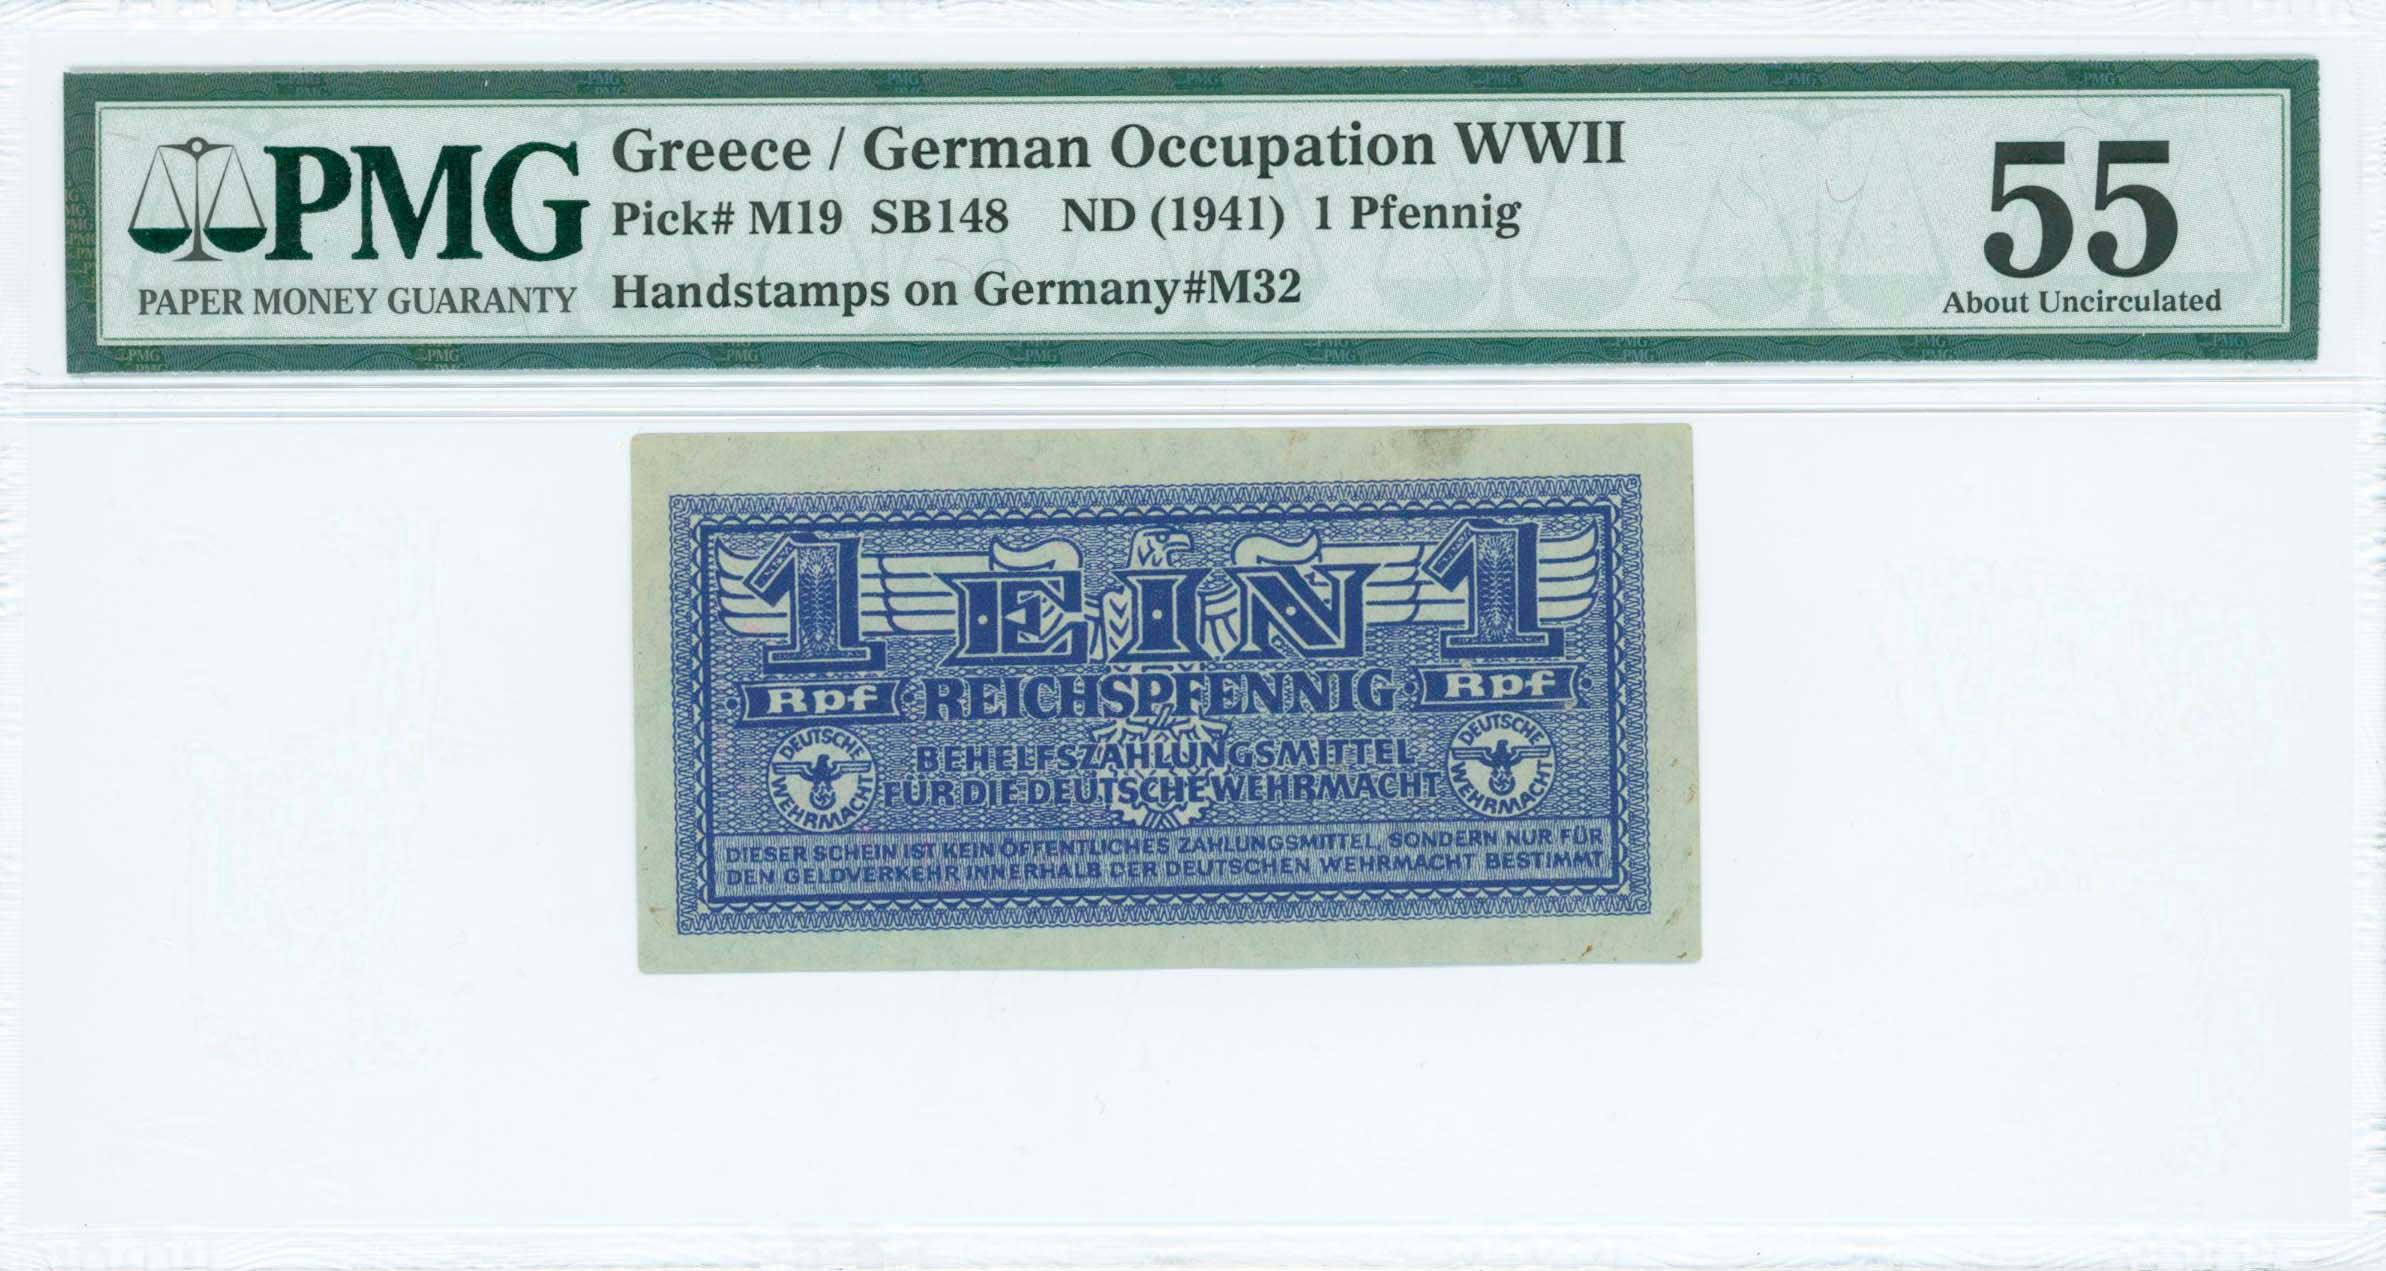 Lot 6515 - -  PAPER MONEY - BANKNOTES german occupation -  A. Karamitsos Public & Live Internet Auction 665 Coins, Medals & Banknotes